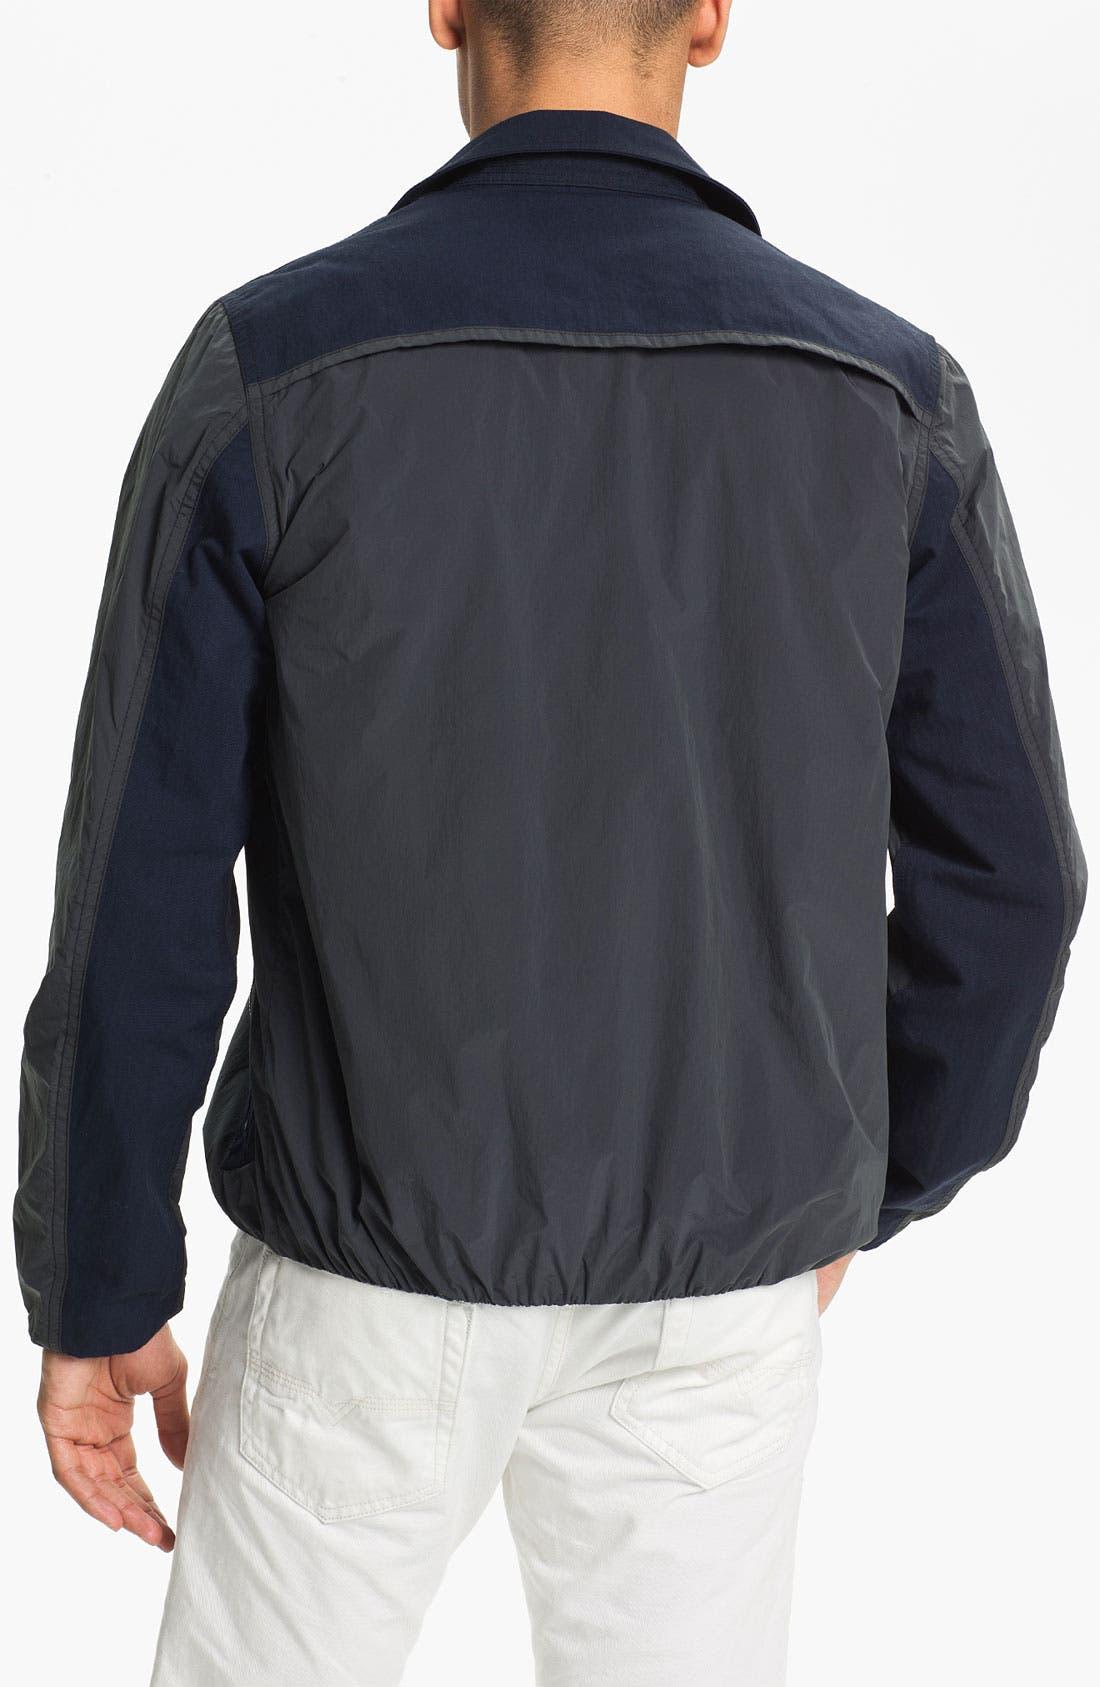 Alternate Image 2  - MARC BY MARC JACOBS 'Nicholson' Reversible Jacket